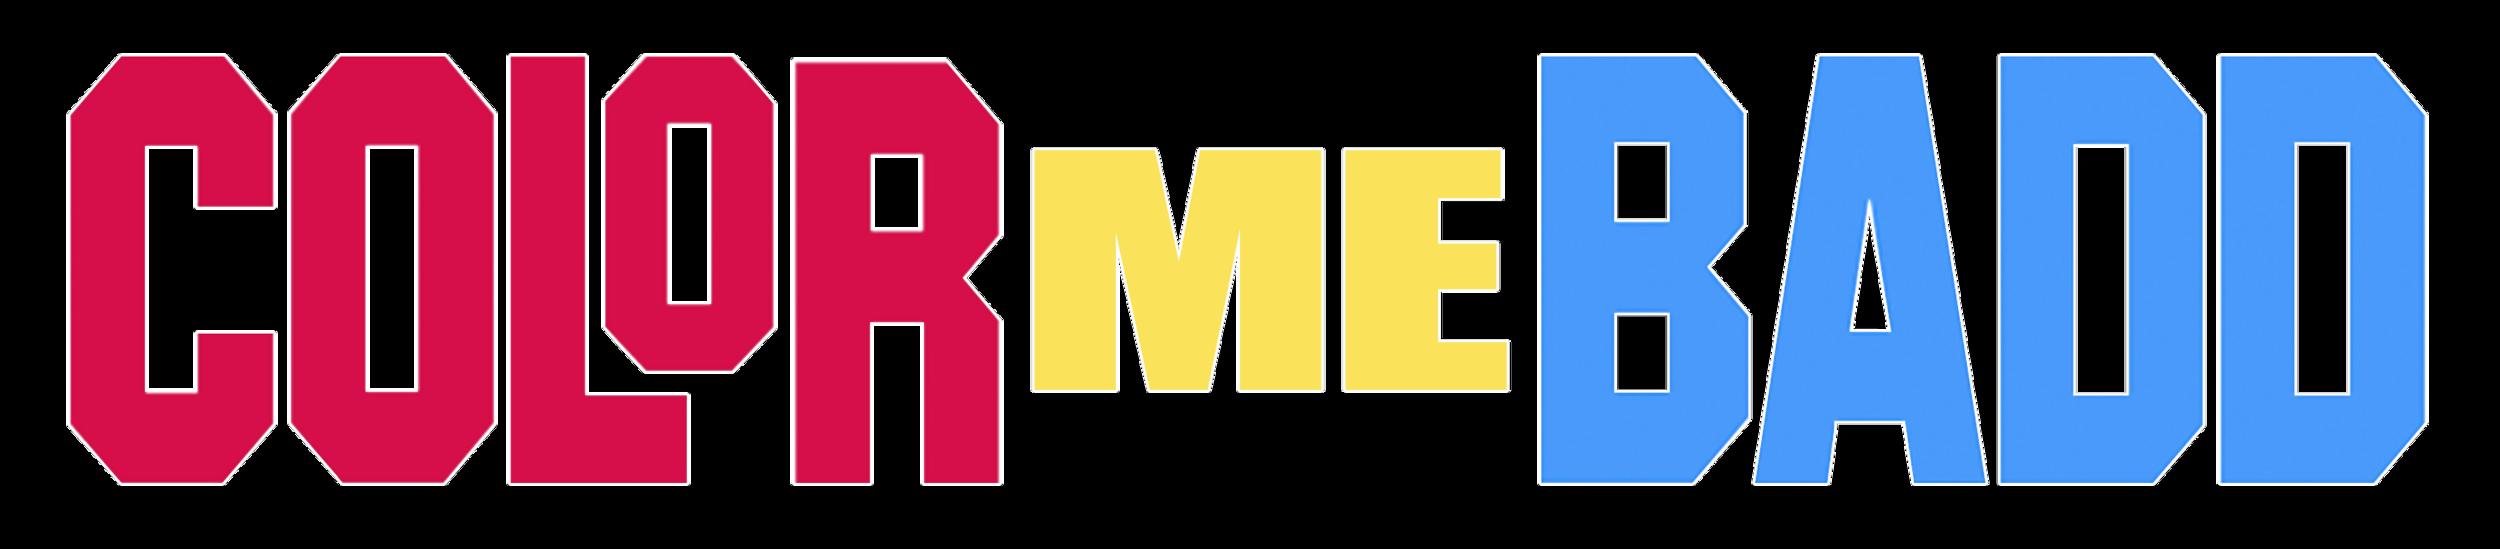 color_me_badd_logo.png